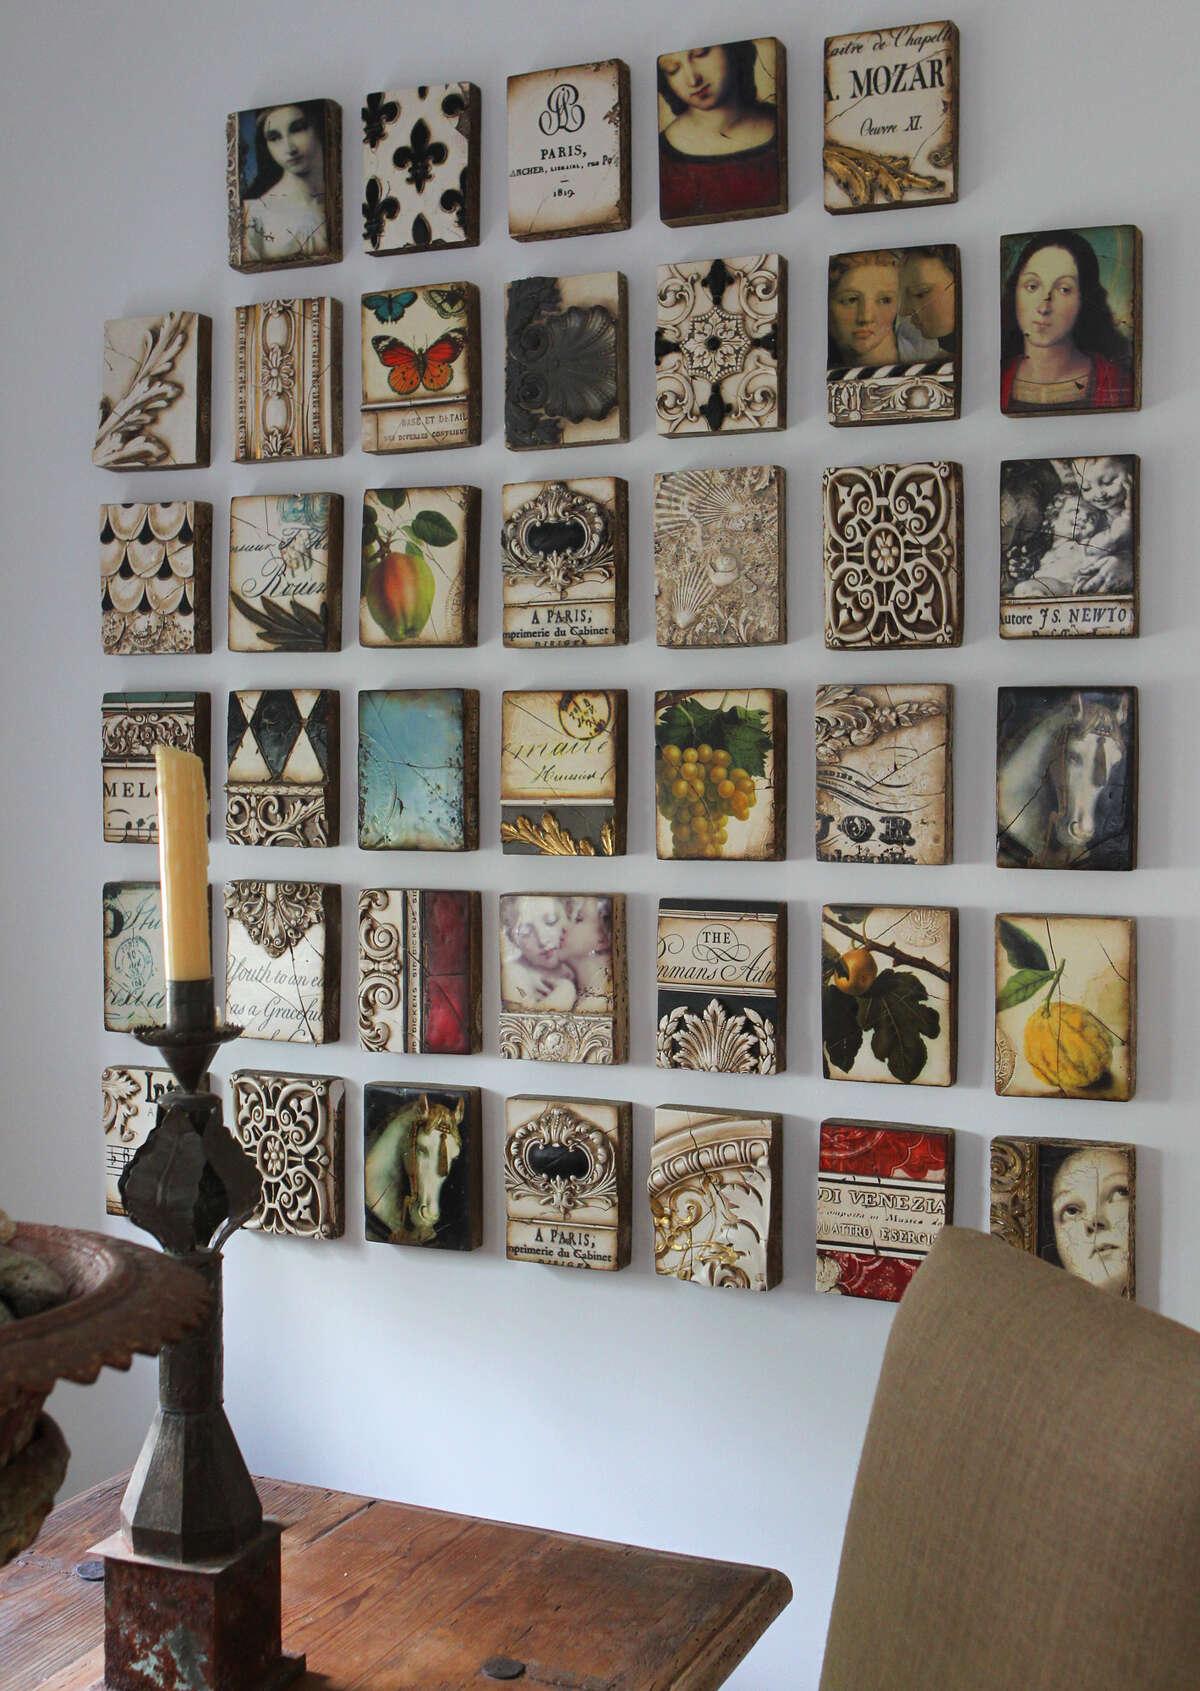 Art work adds interest to a kitchen wall in the Monticello home of Freddie Delgado. (Wednesday April 11, 2012) John Davenport/San Antonio Express-News